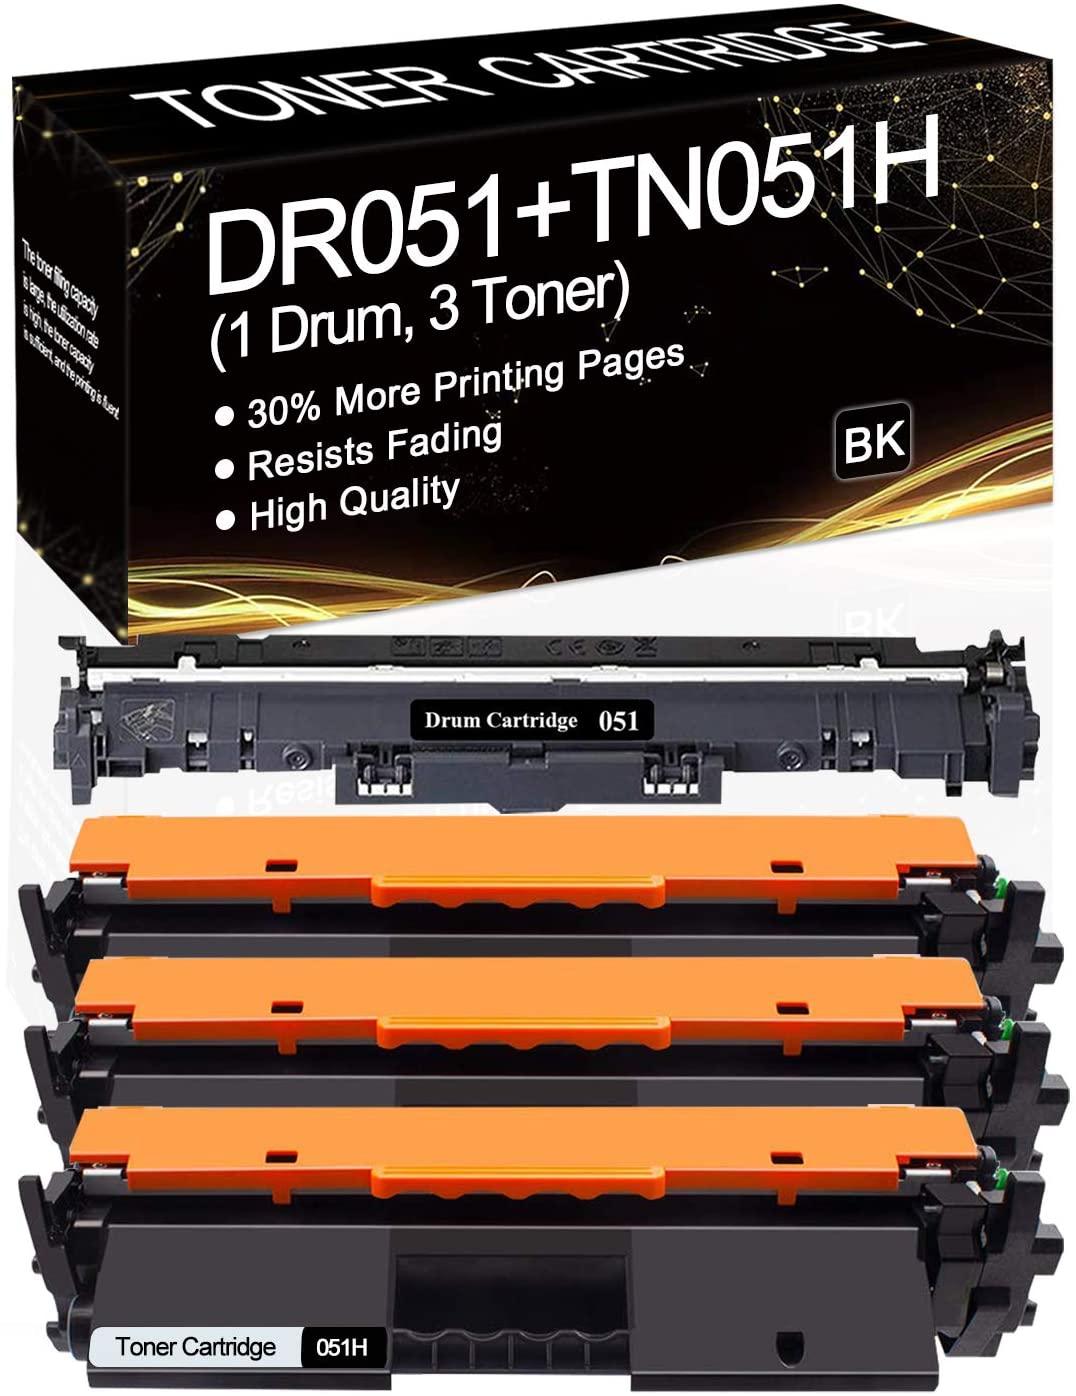 (1-Pack 051 Drum,3-Pack 051H Toner) Compatible Drum & Toner Cartridge Replacement for Canon i-SENSYS MF260 LBP260 Canon ImageCLASS LBP161dw MF263dw LBP160 Printer,Sold by SinaToner.